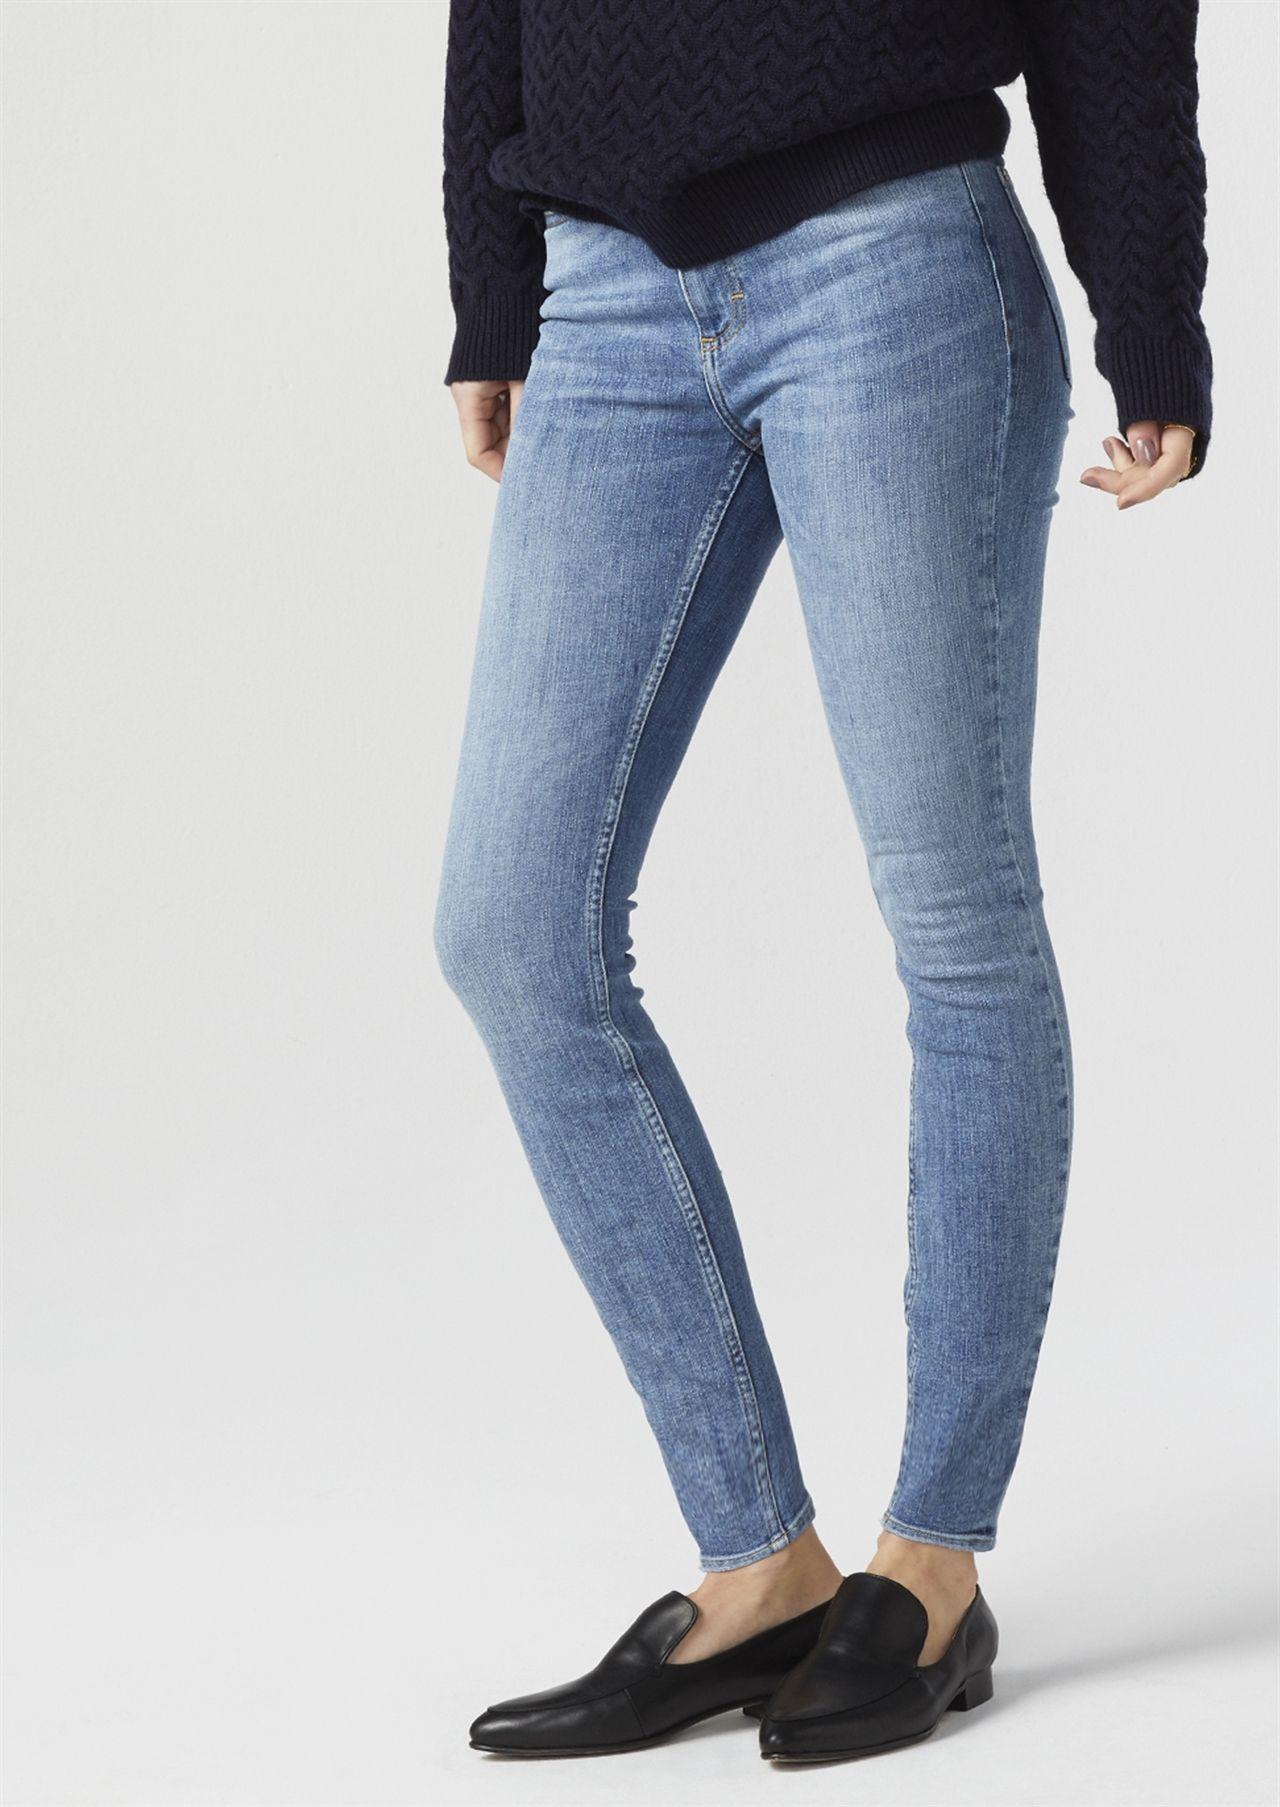 twist tango jeans